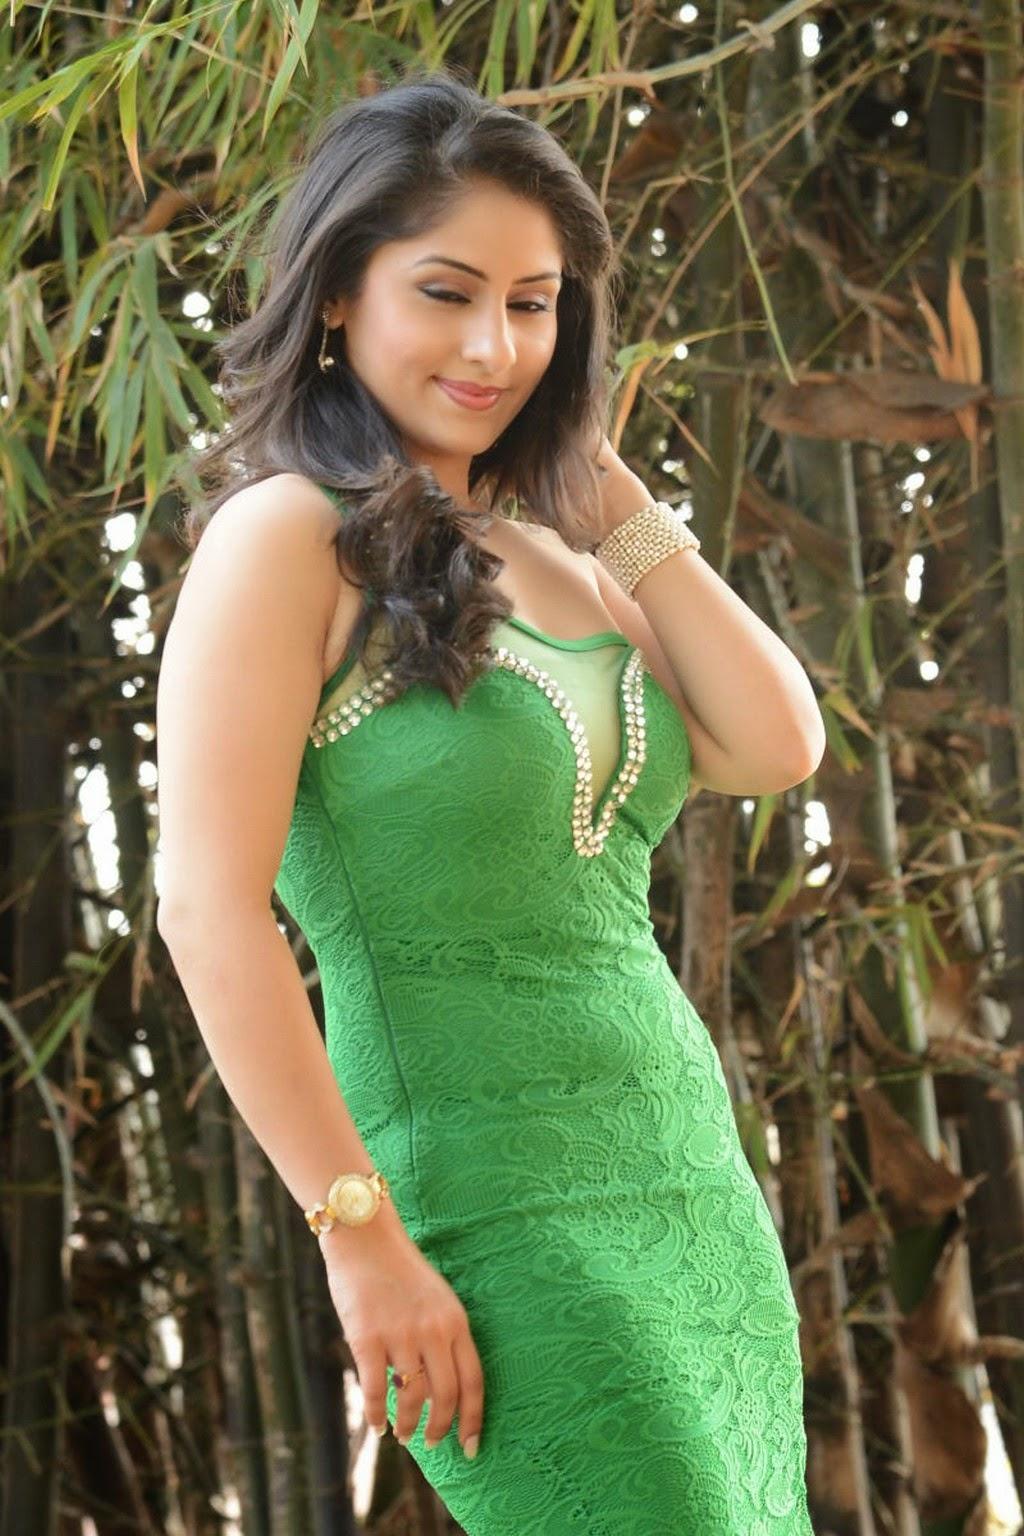 sumon4all: Ankita Sharma-1.2